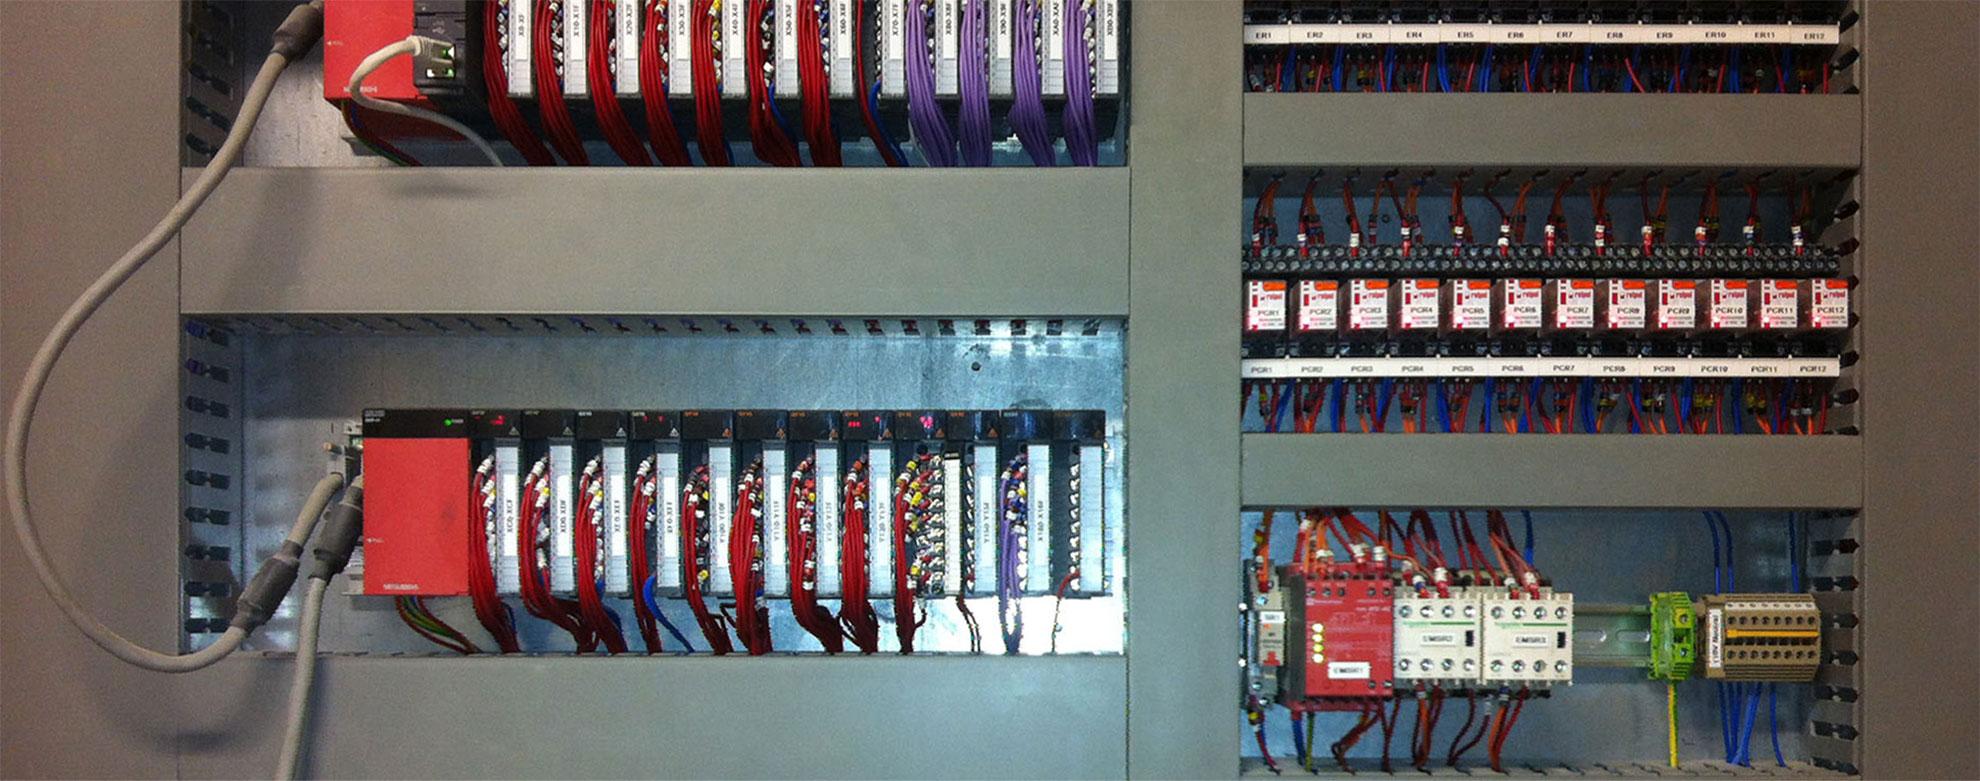 Trident Controls Electrical Control Panel Slide 1 BG